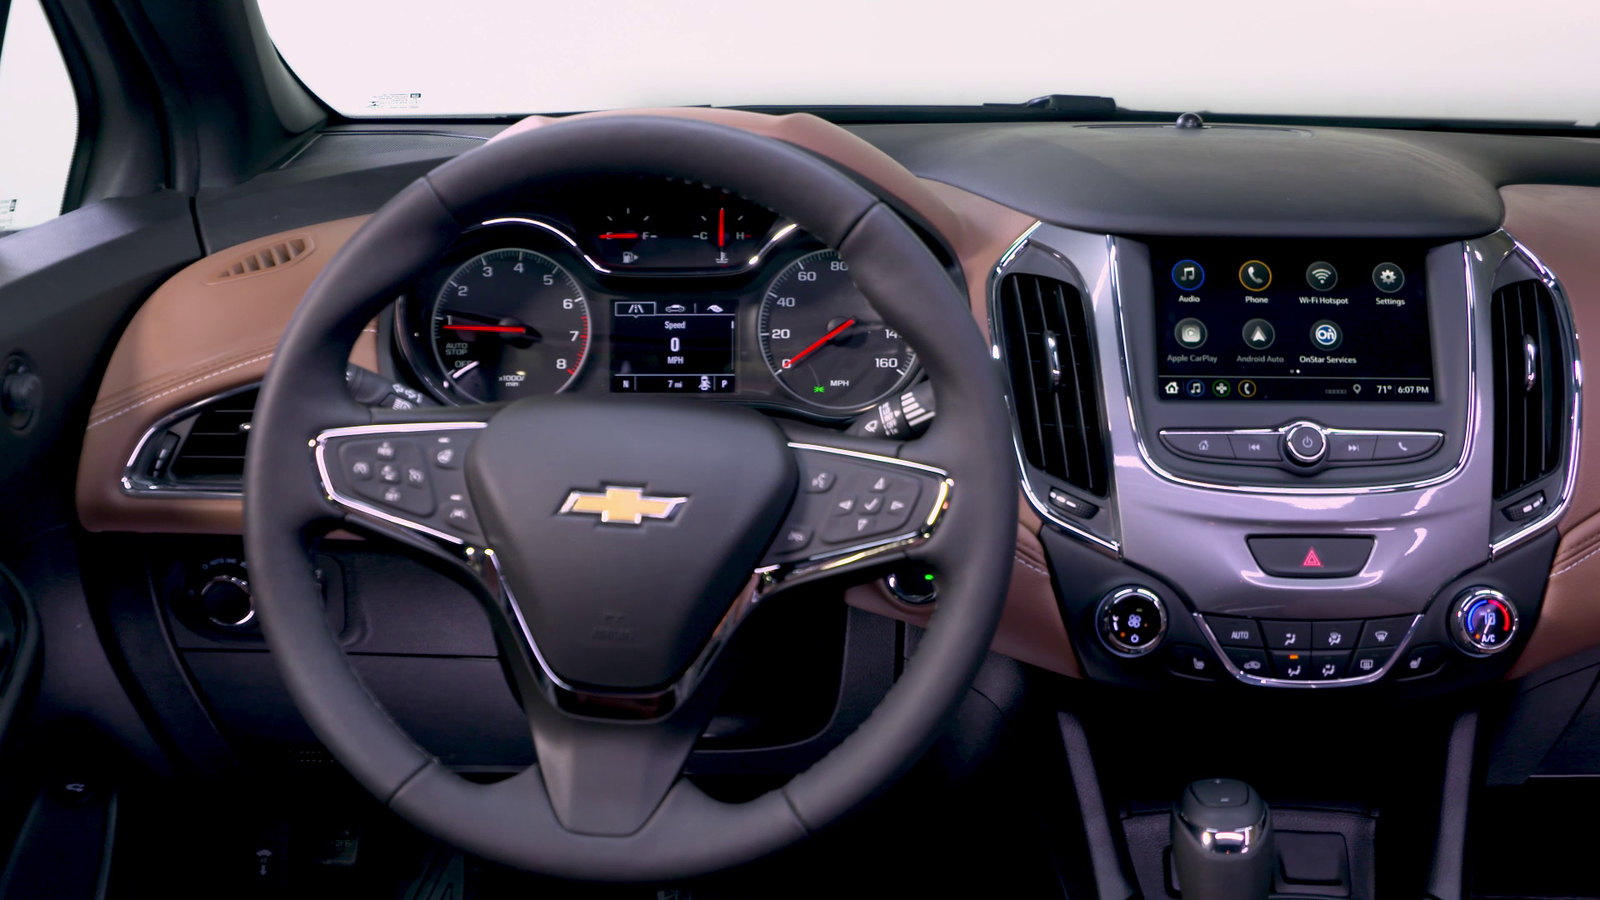 Carsdrive Cordoba Asi El El Chevrolet Cruze 2019 Carsdrive Cordoba